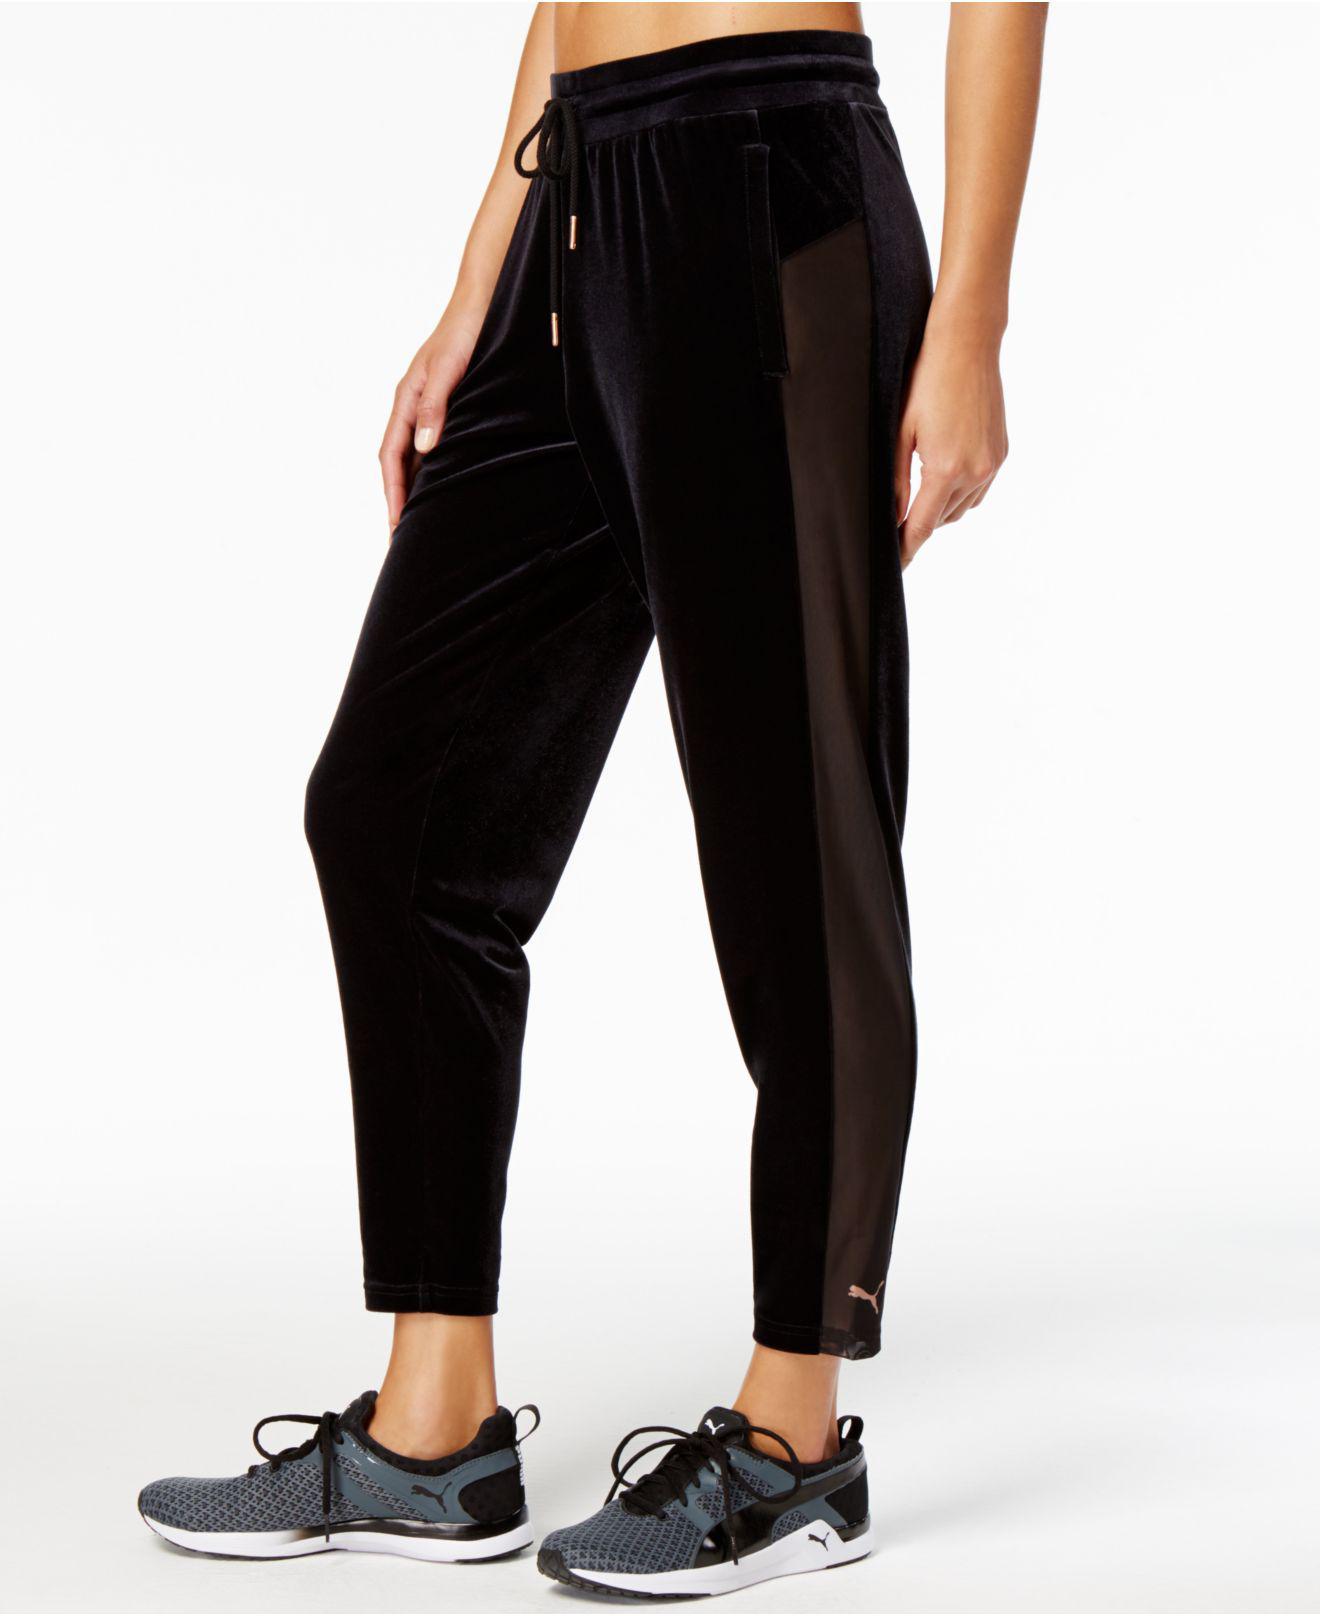 separation shoes a636f e3b0f PUMA Yogini Velvet Pants in Black - Lyst